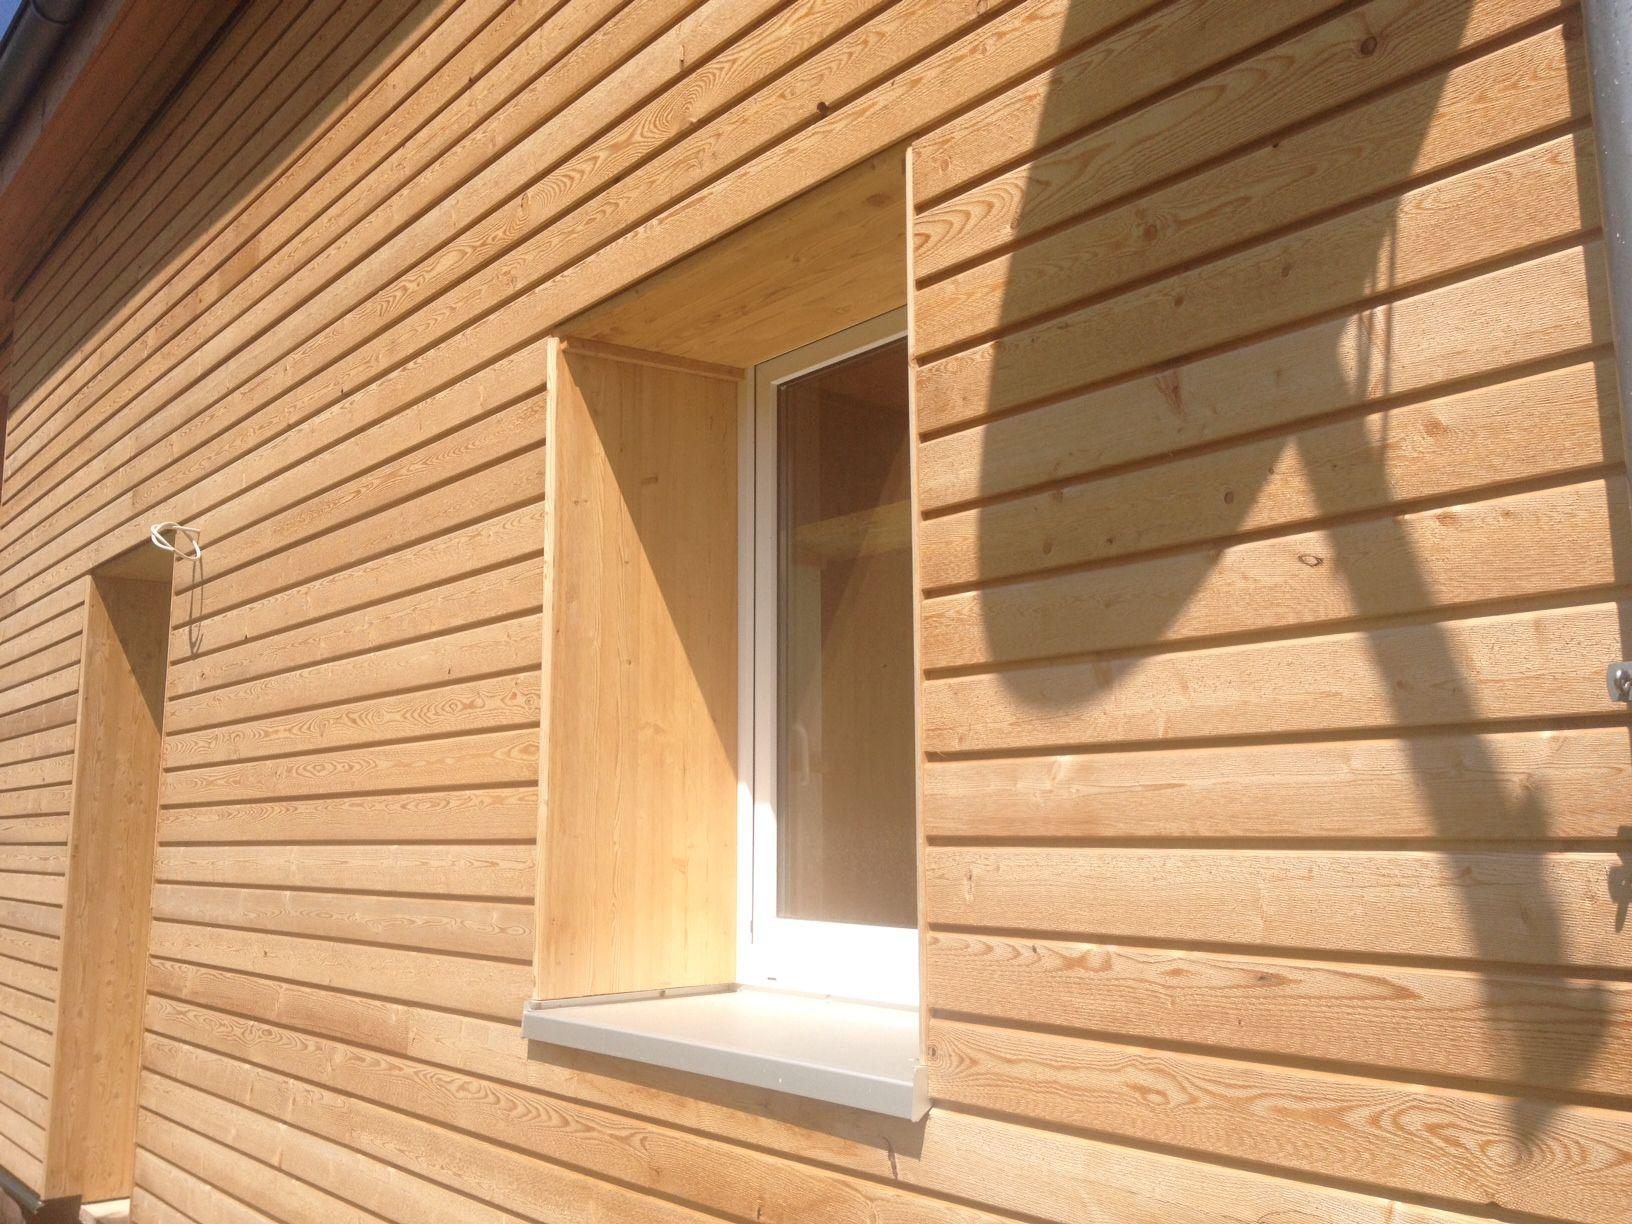 fassadenprofil profilholz sibirische l rche holzprodukte pinterest house. Black Bedroom Furniture Sets. Home Design Ideas